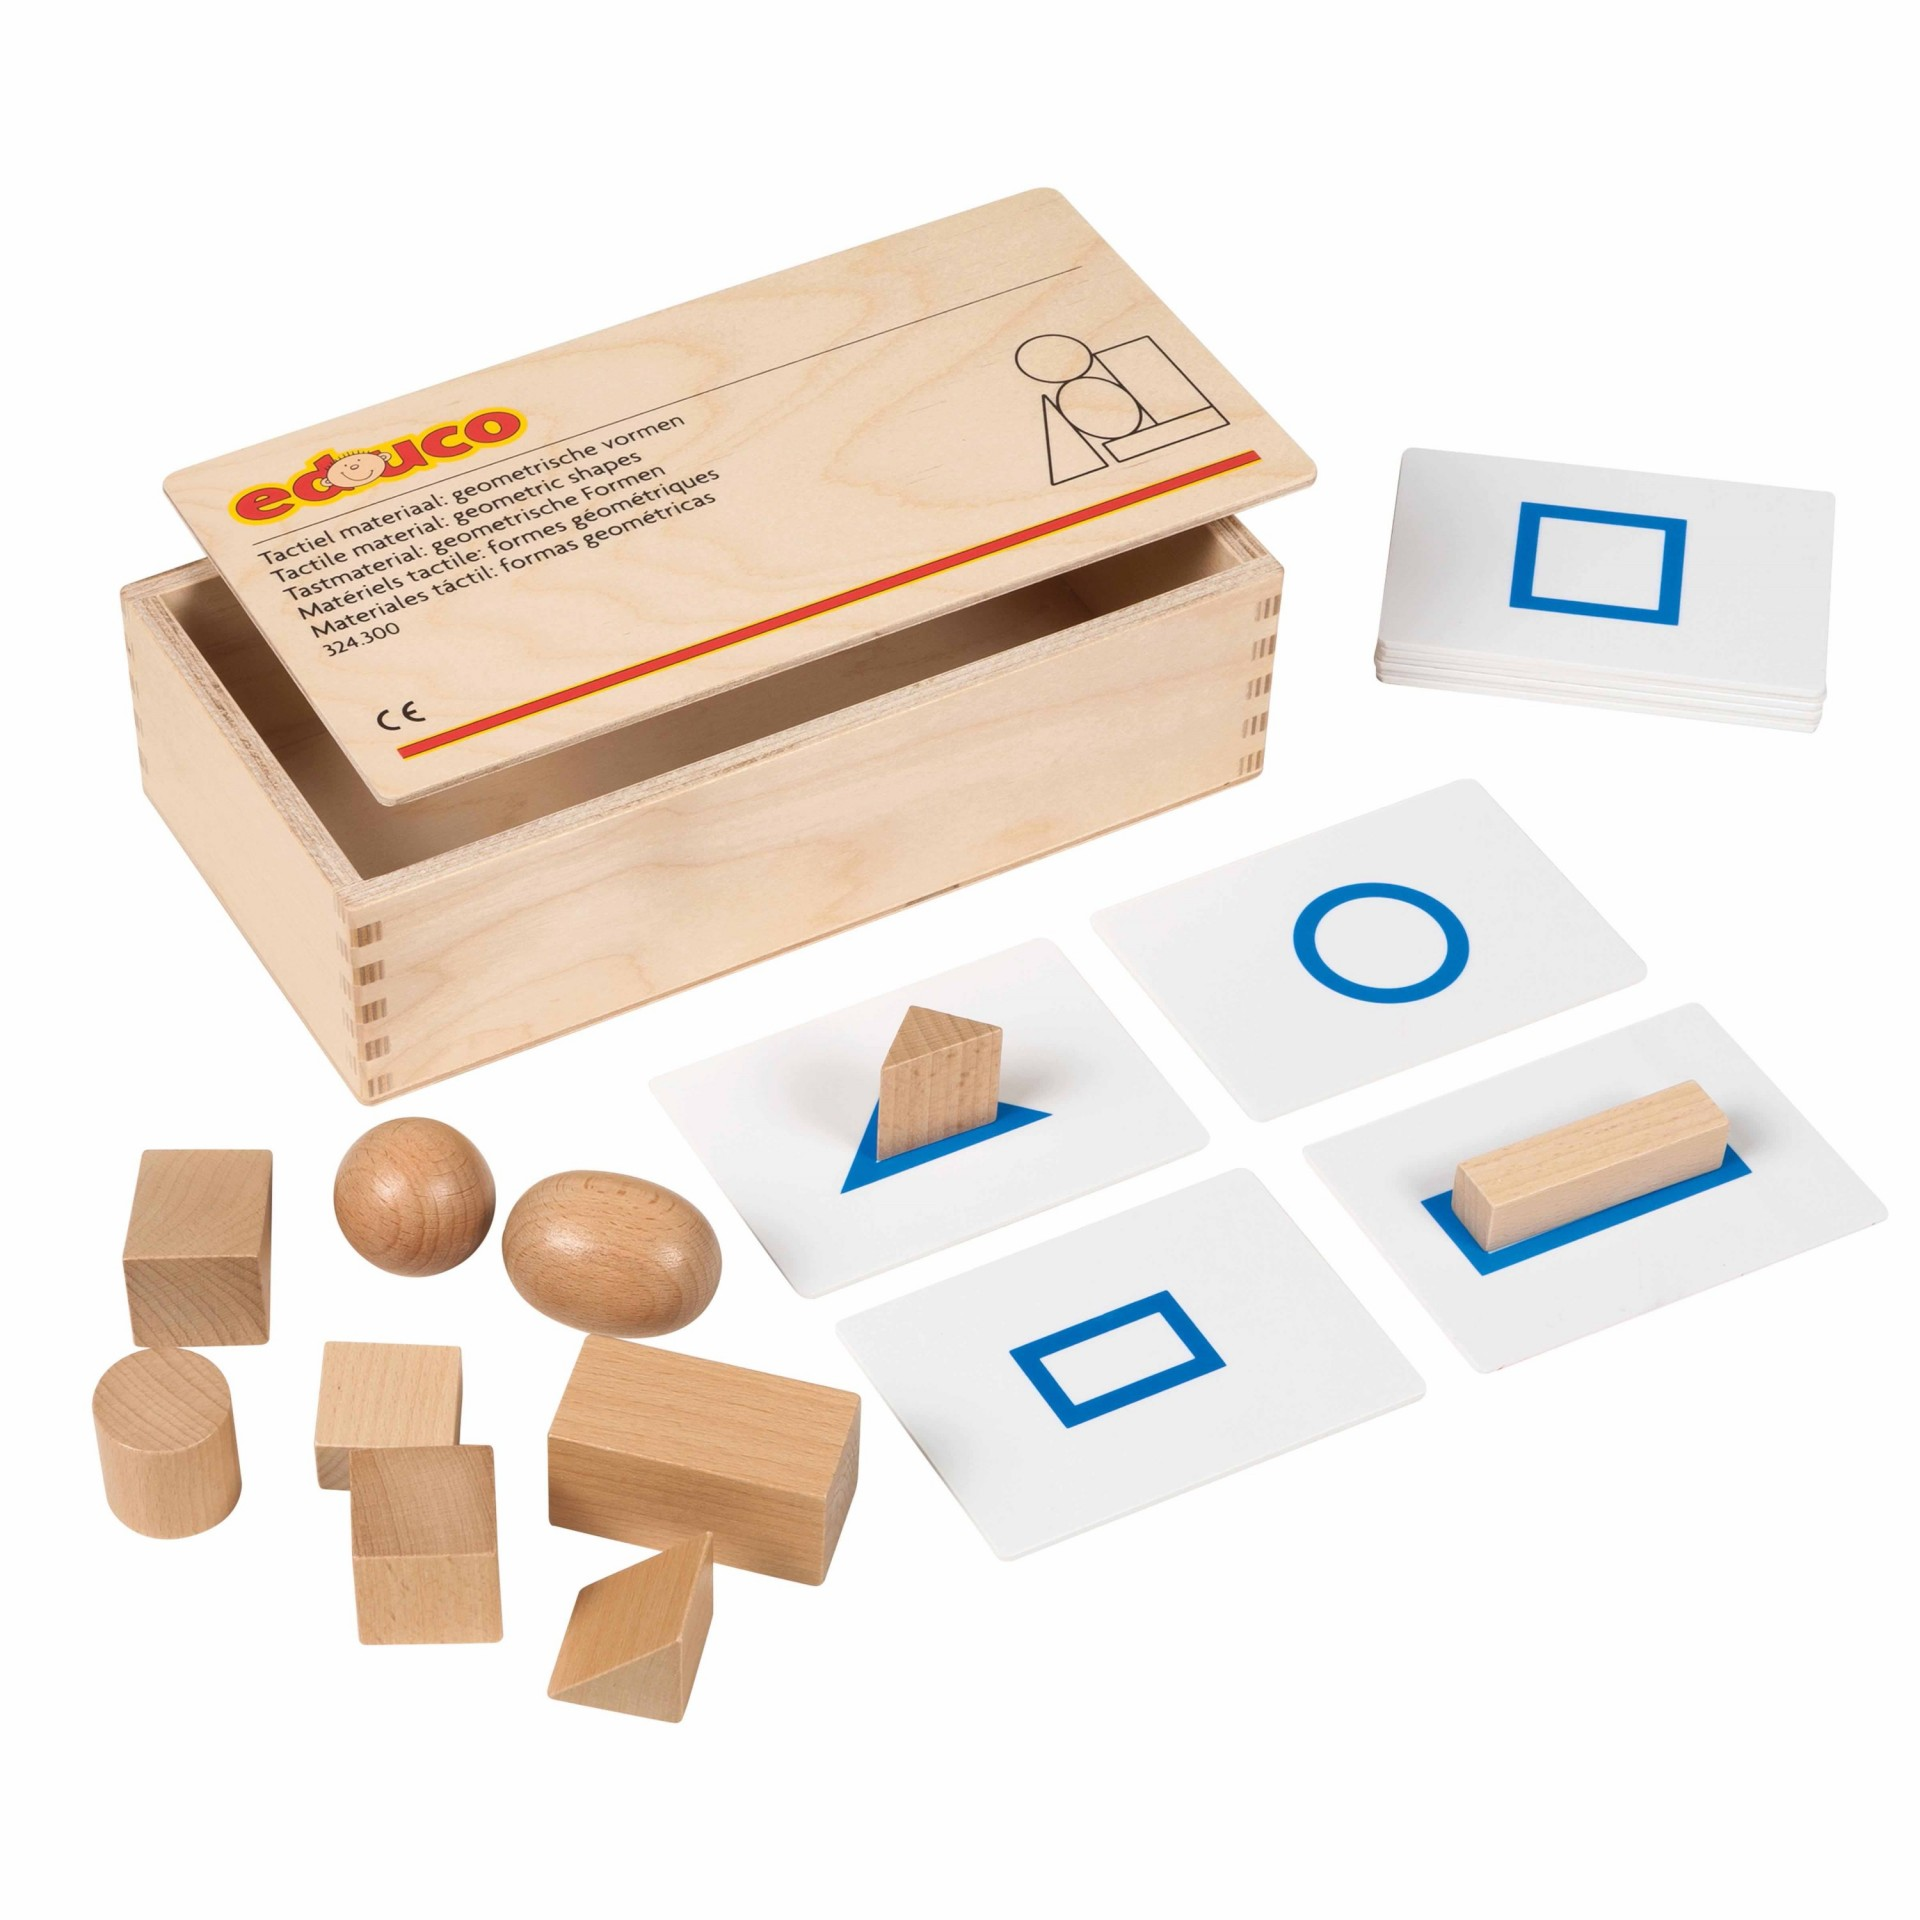 Sólidos Geométricos - Material Táctil